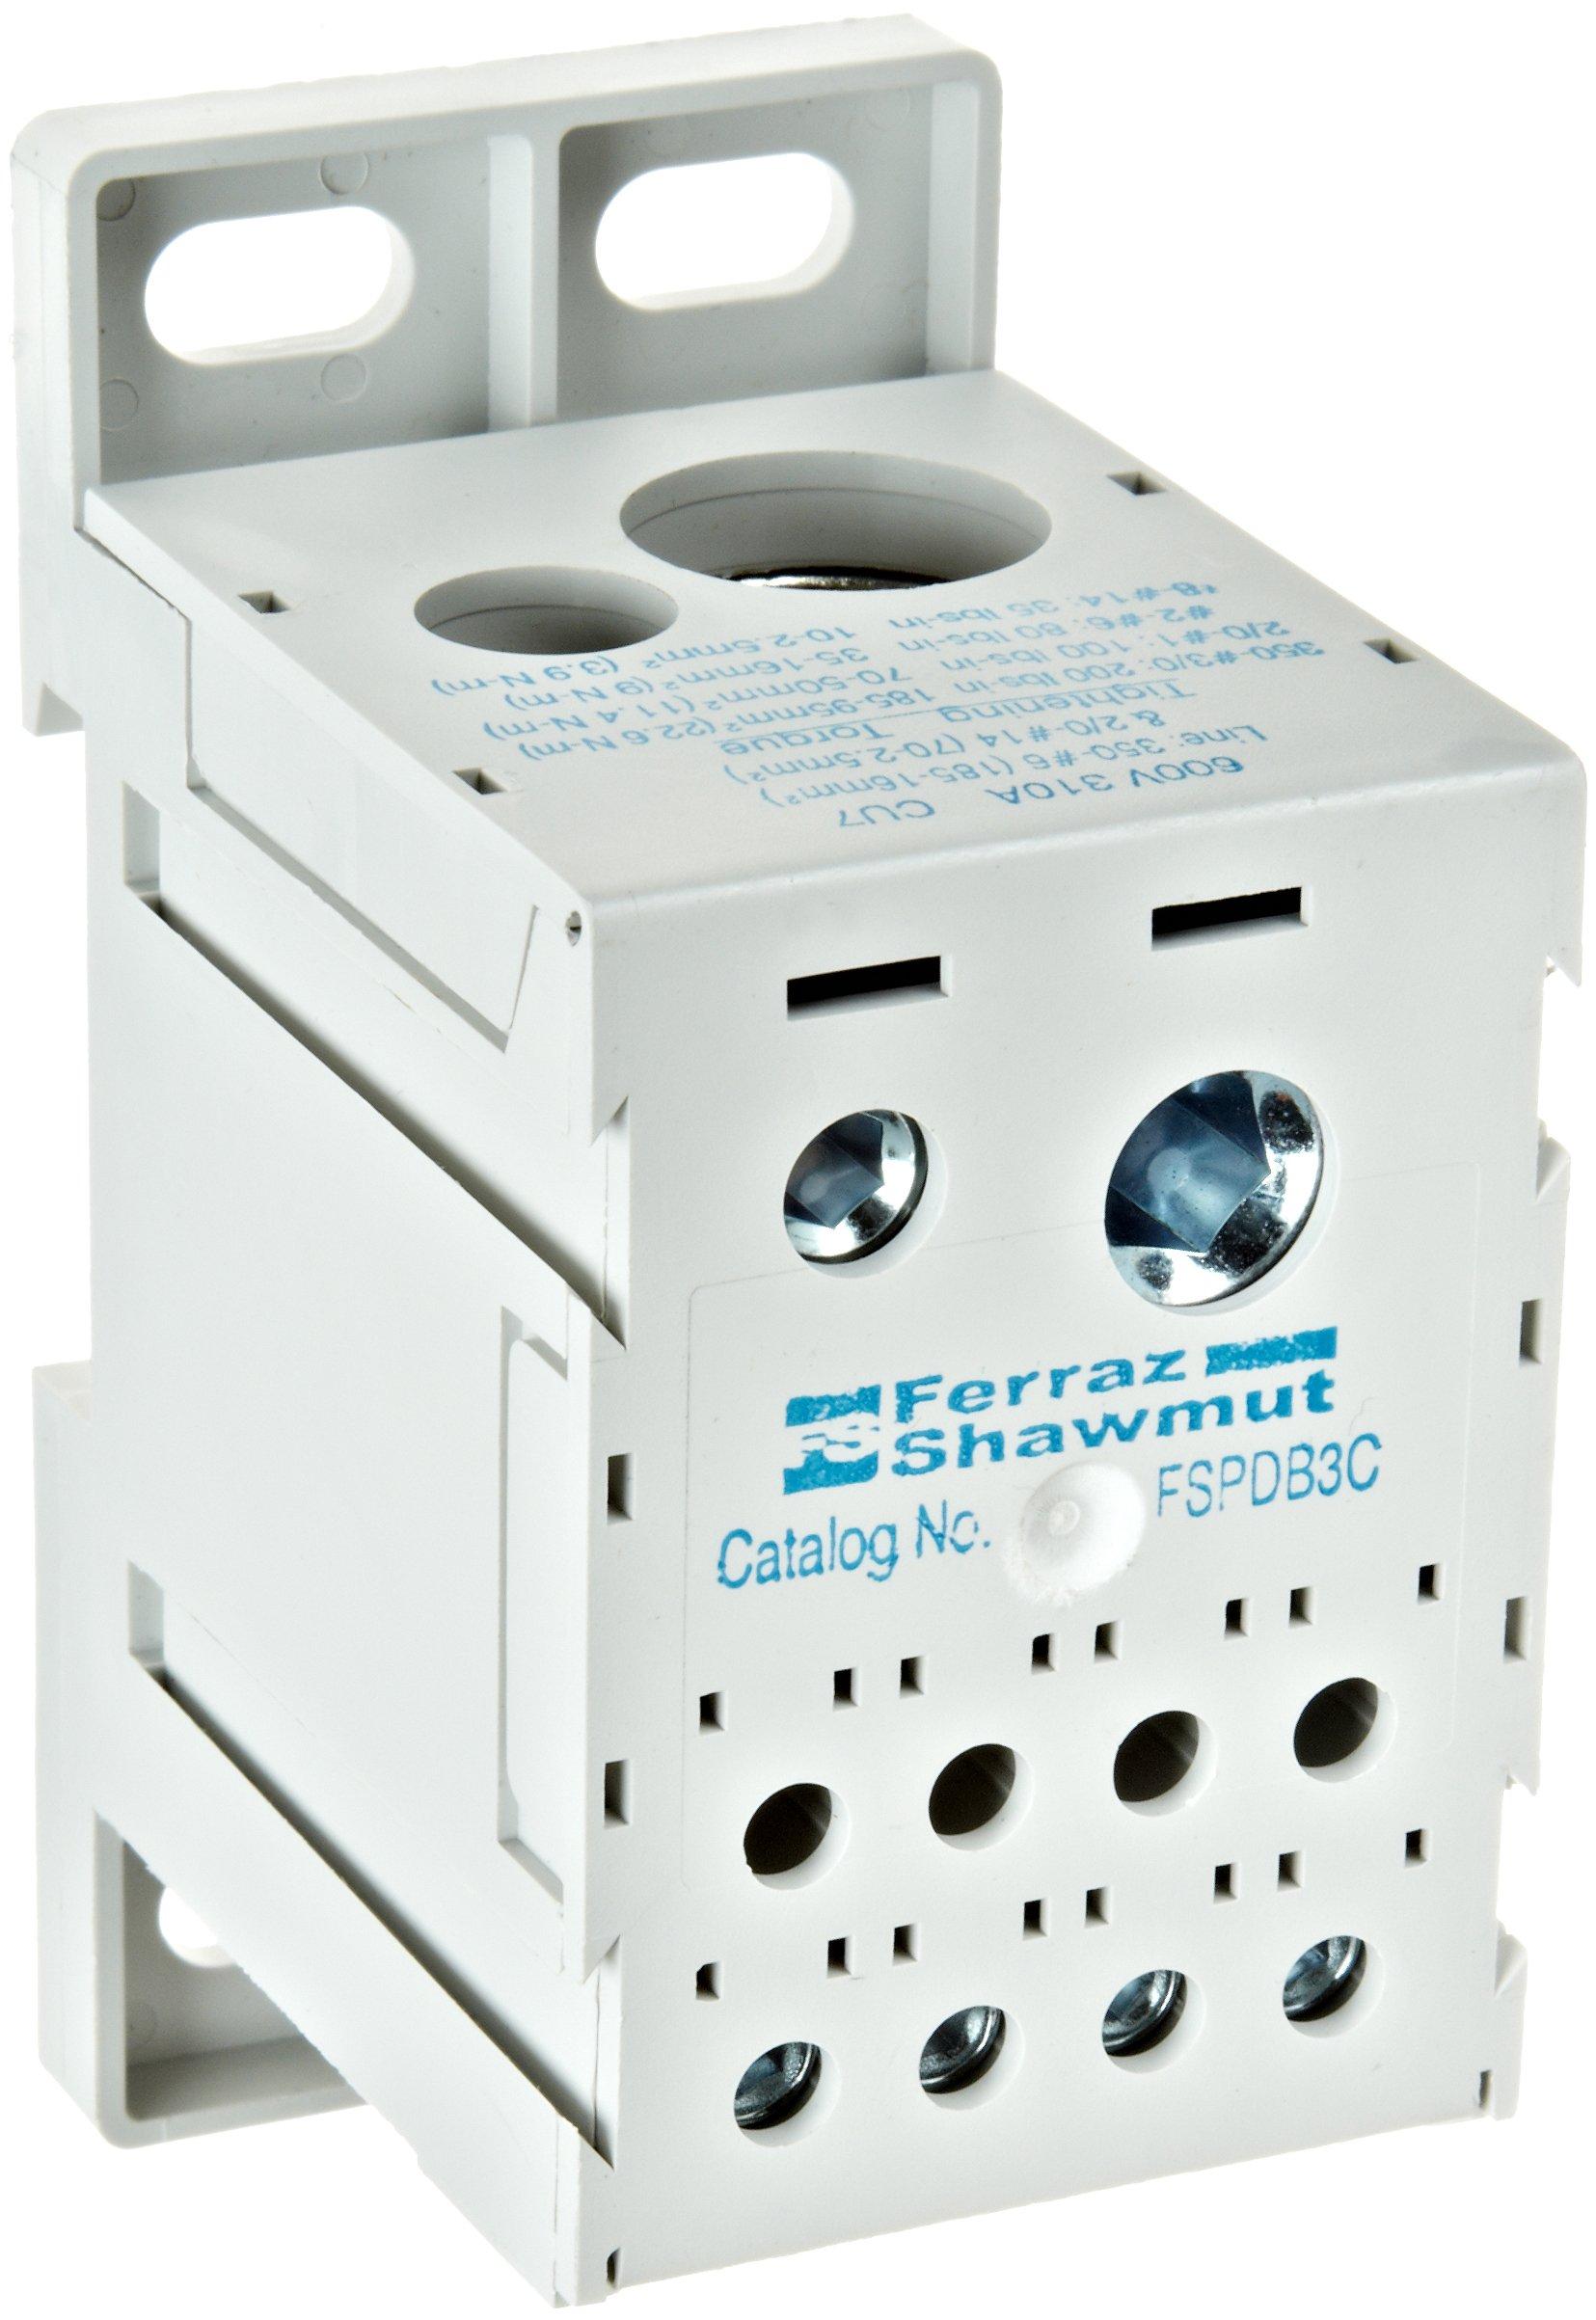 Mersen FSPDB3C Copper Finger-Safe Power Distribution Block, 600VAC/DC, 100kA, 310 Ampere, 3-31/32'' Length x 2-17/32'' Width x 1-27/32'' Height